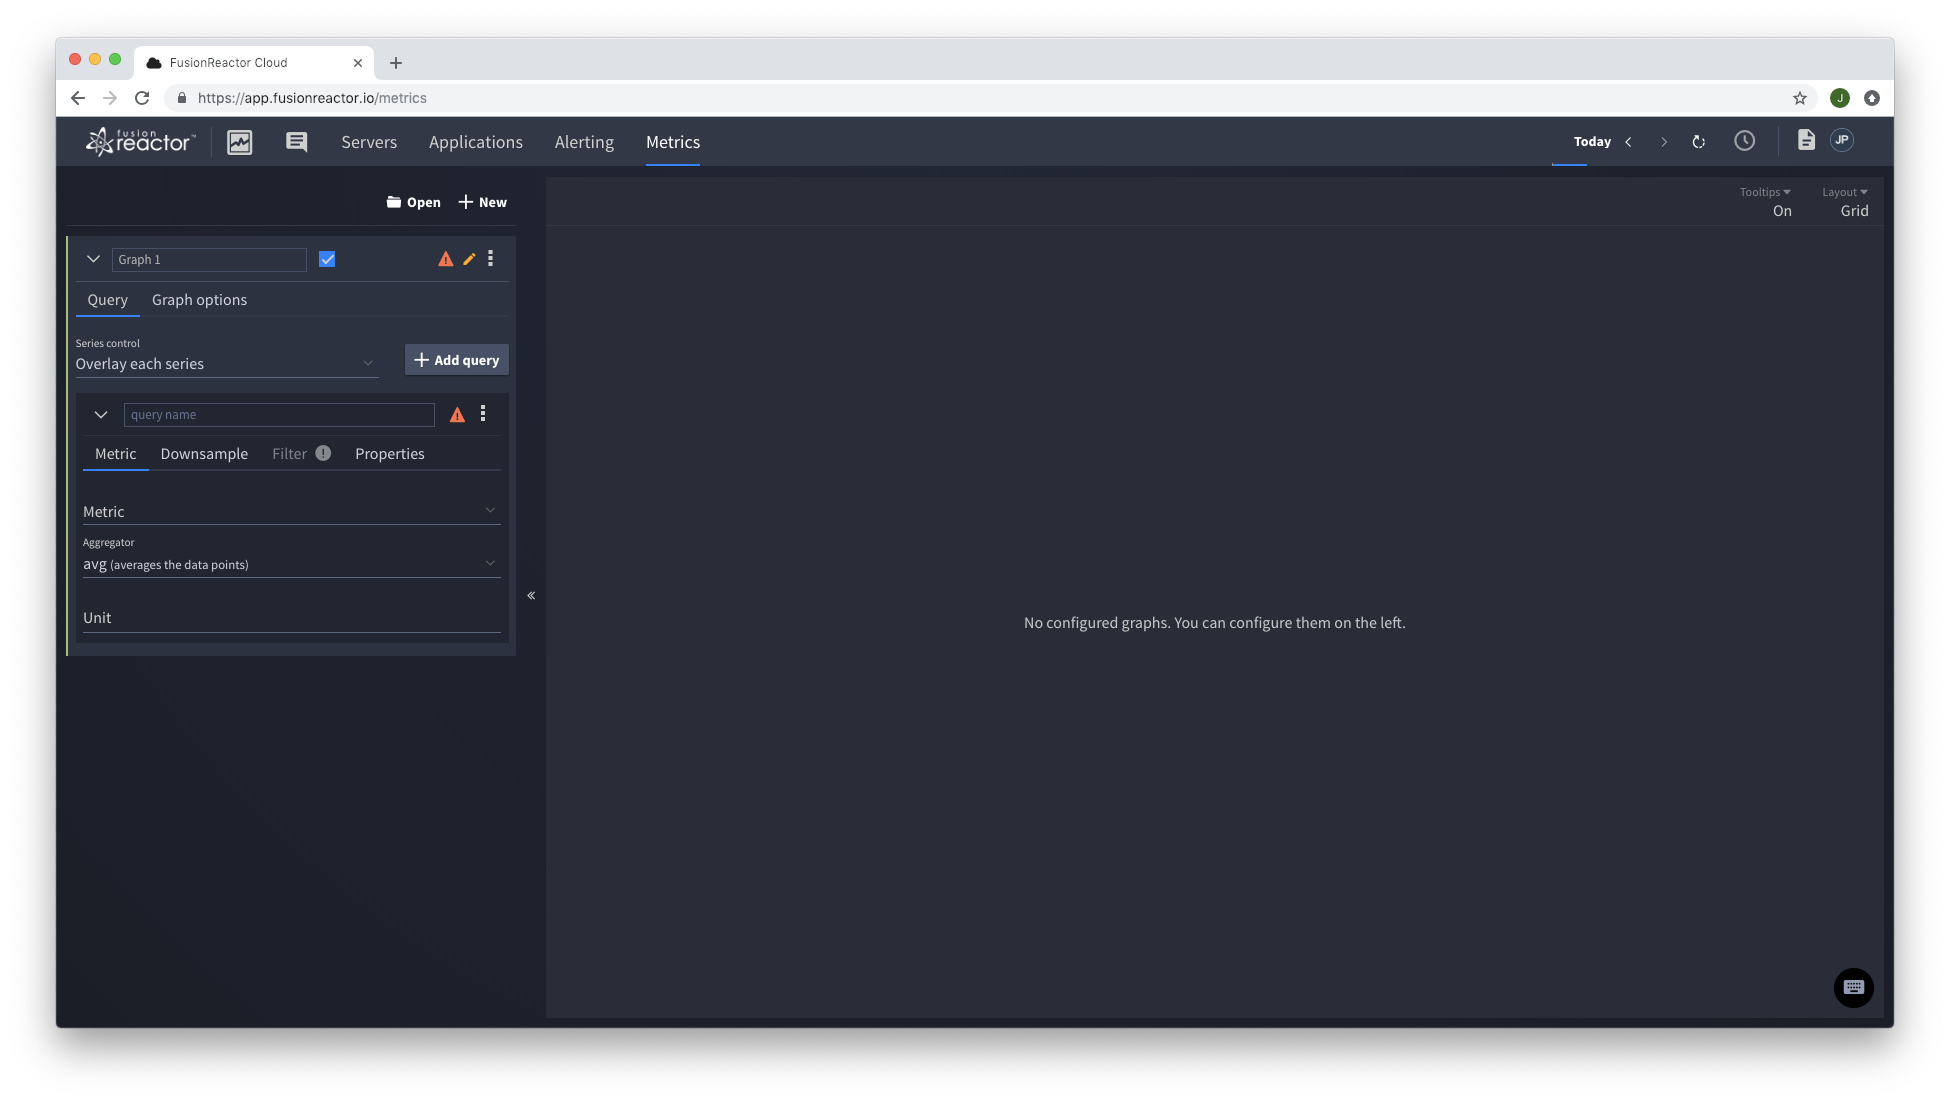 Web Metrics Explorer FusionReactor Cloud